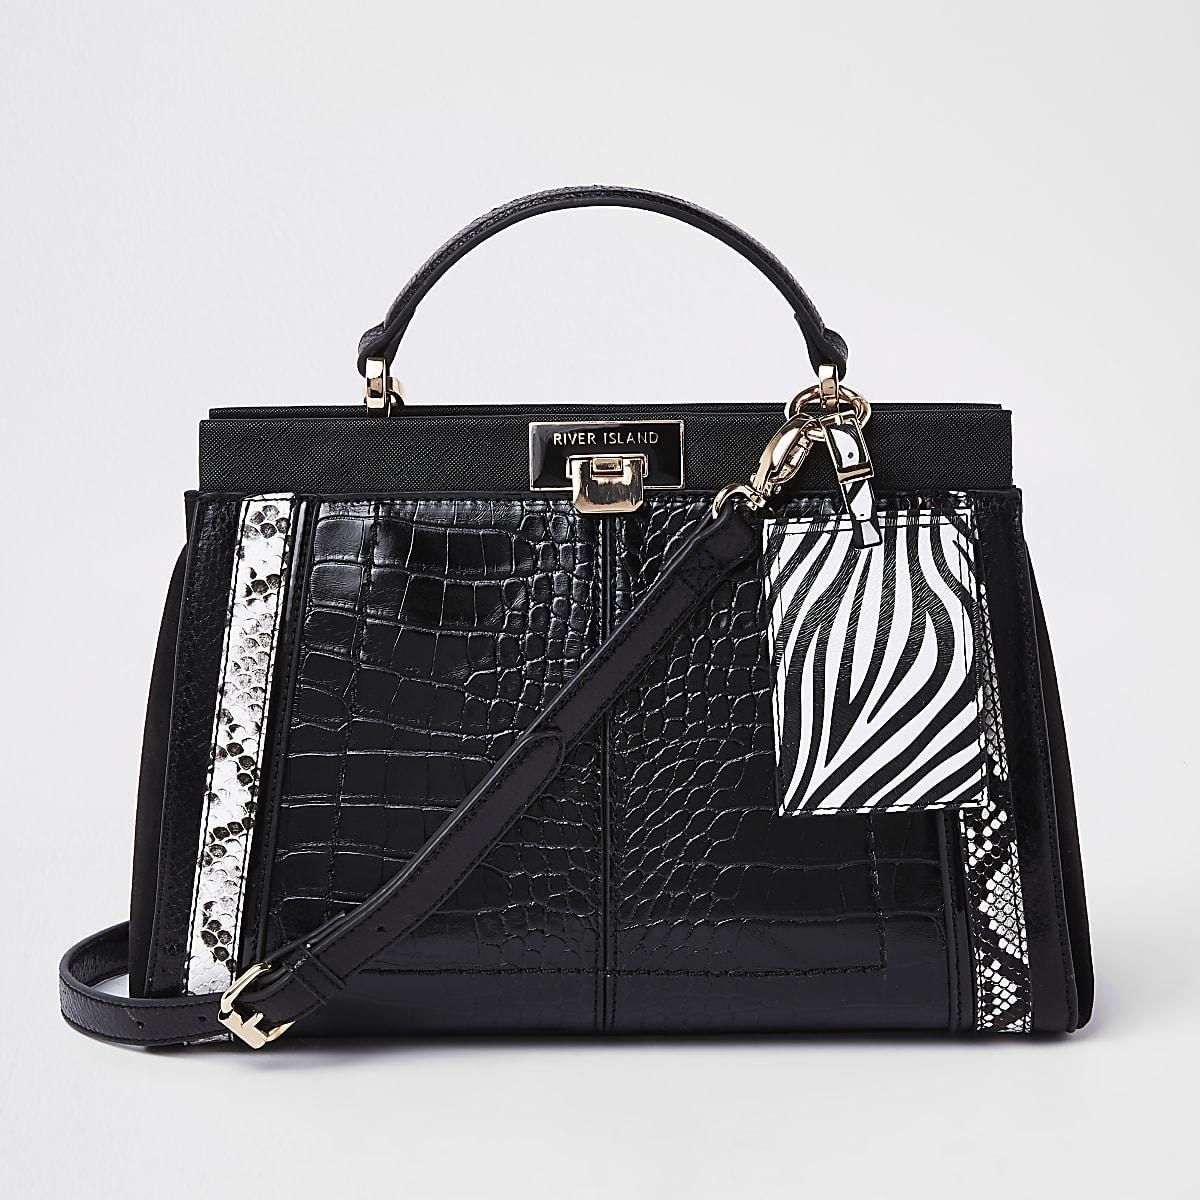 Schwarze Tote Bag in Kroko-Optik mit Animal-Print-Einsatz